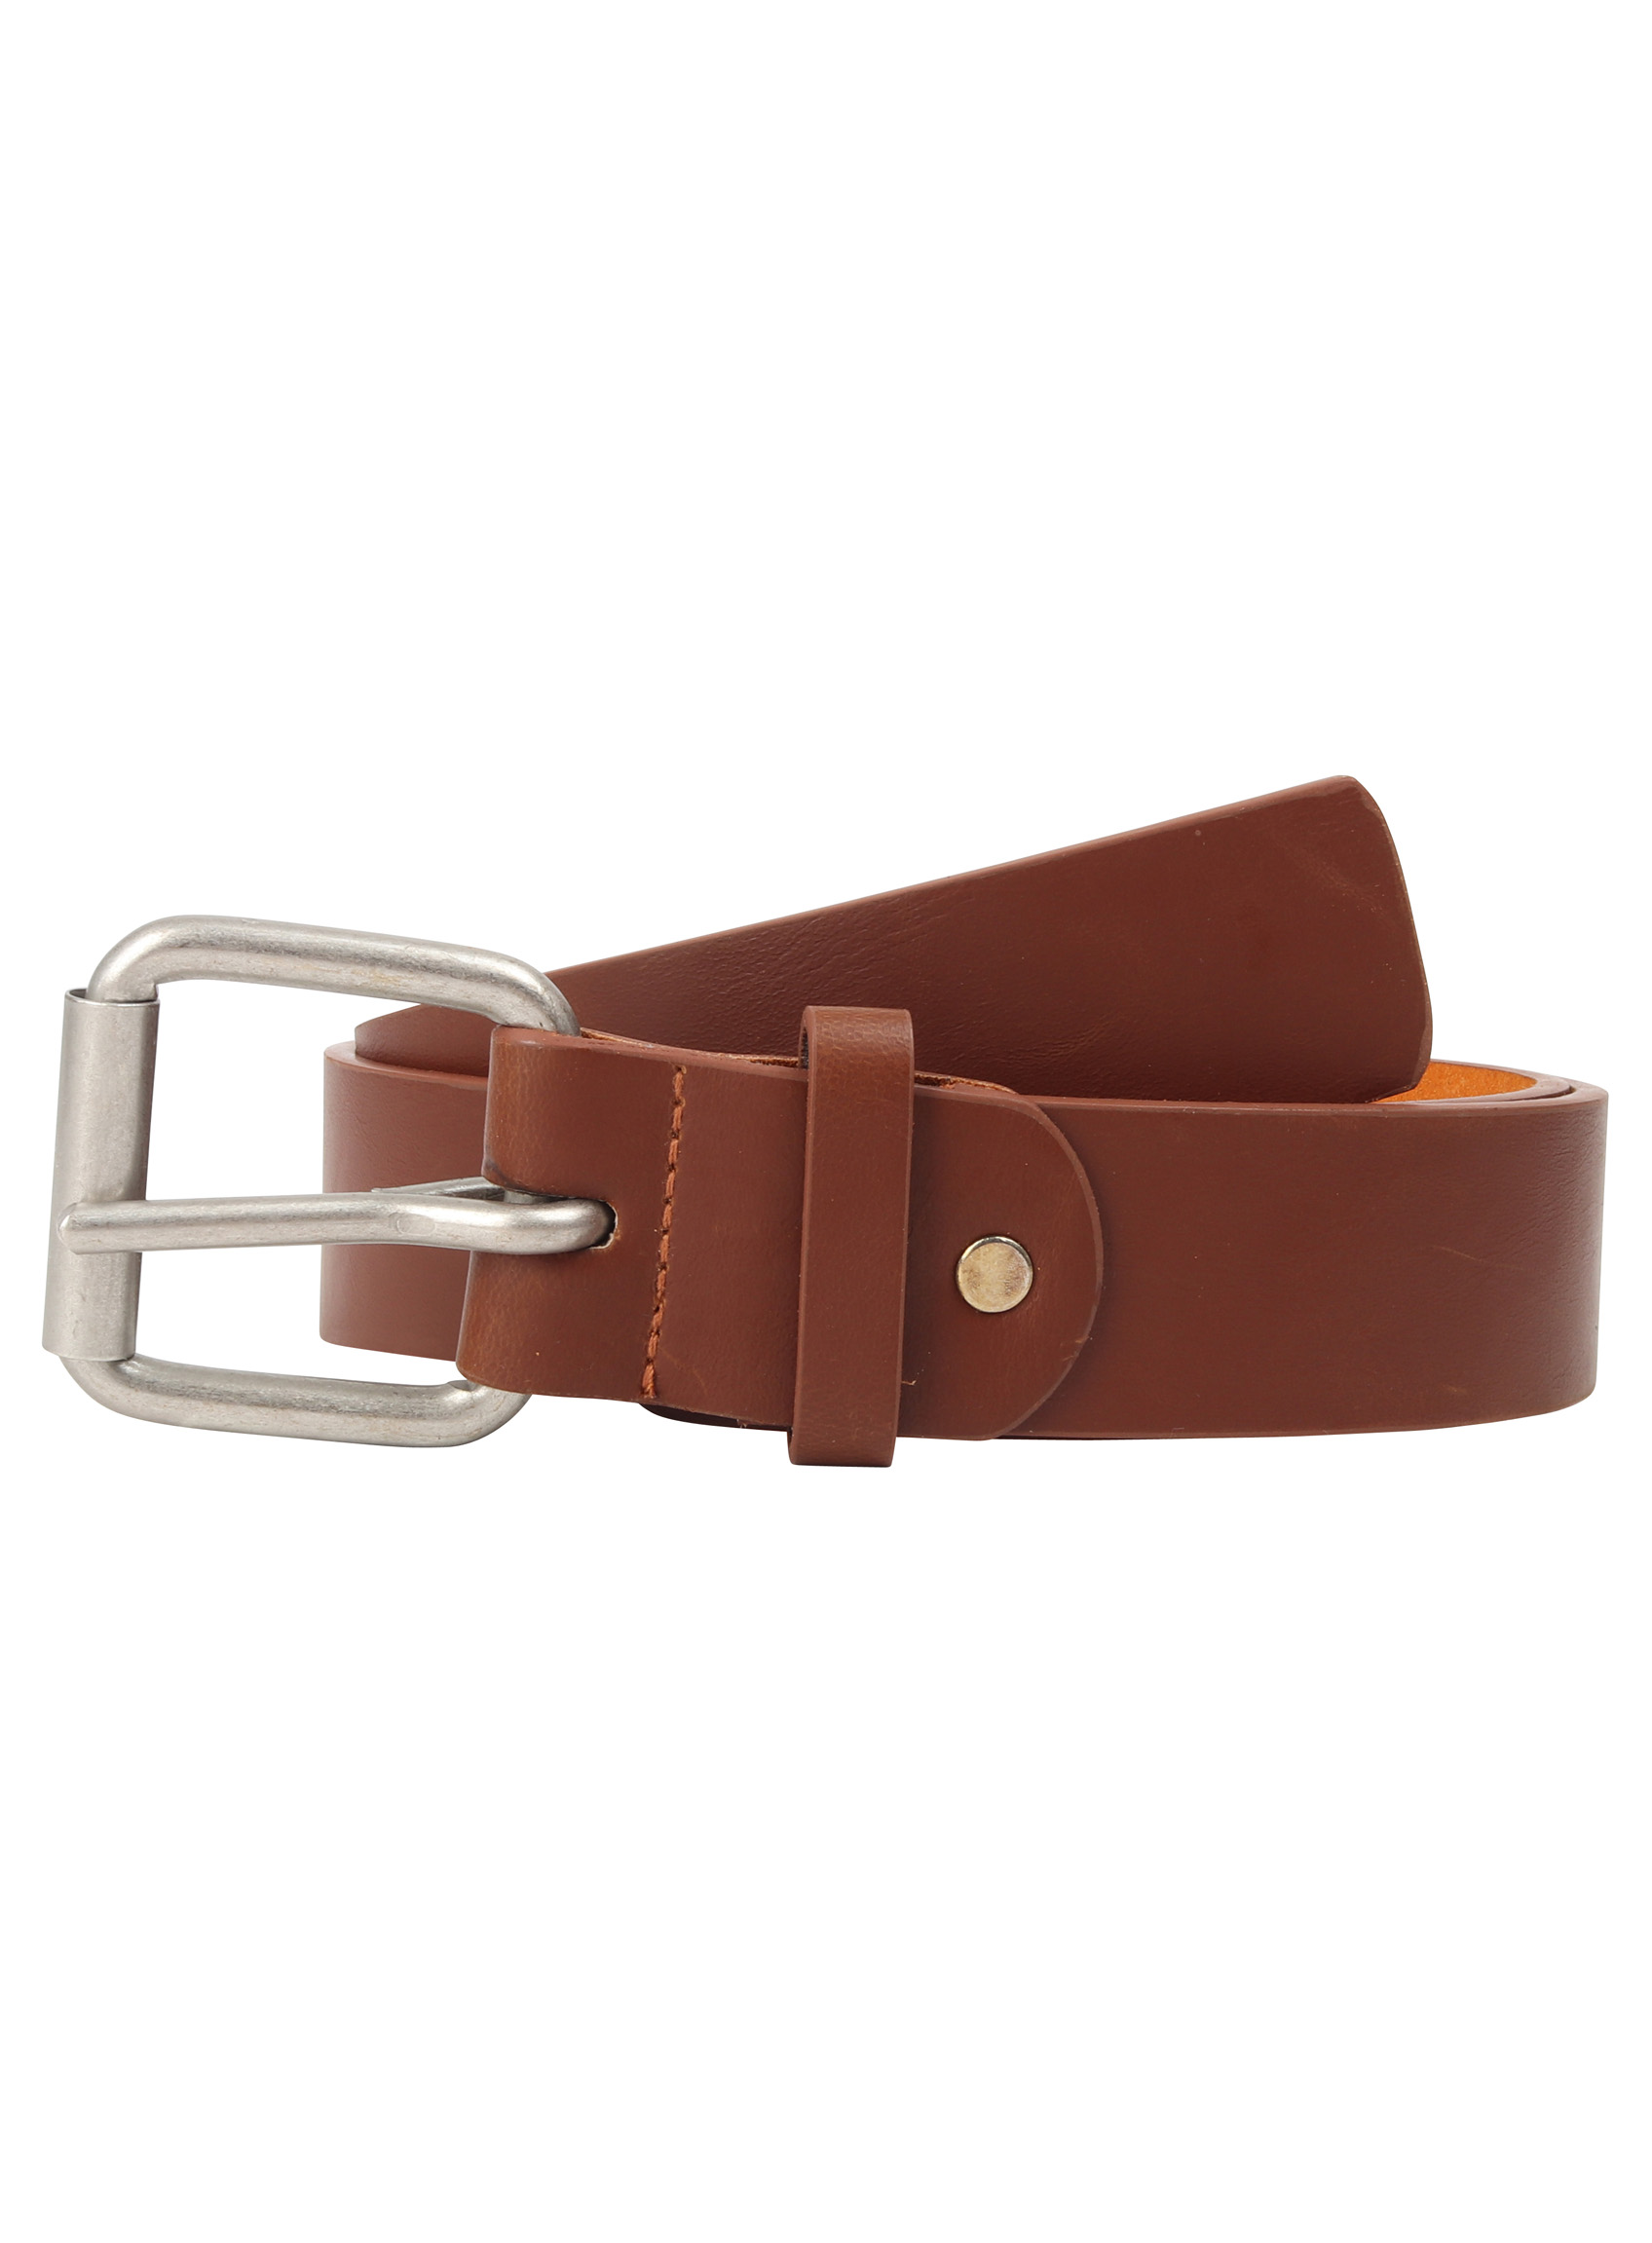 "Black New Forest Belts® Men/'s Leather Jeans Belt 1.5/"" Wide Brown or Tan"